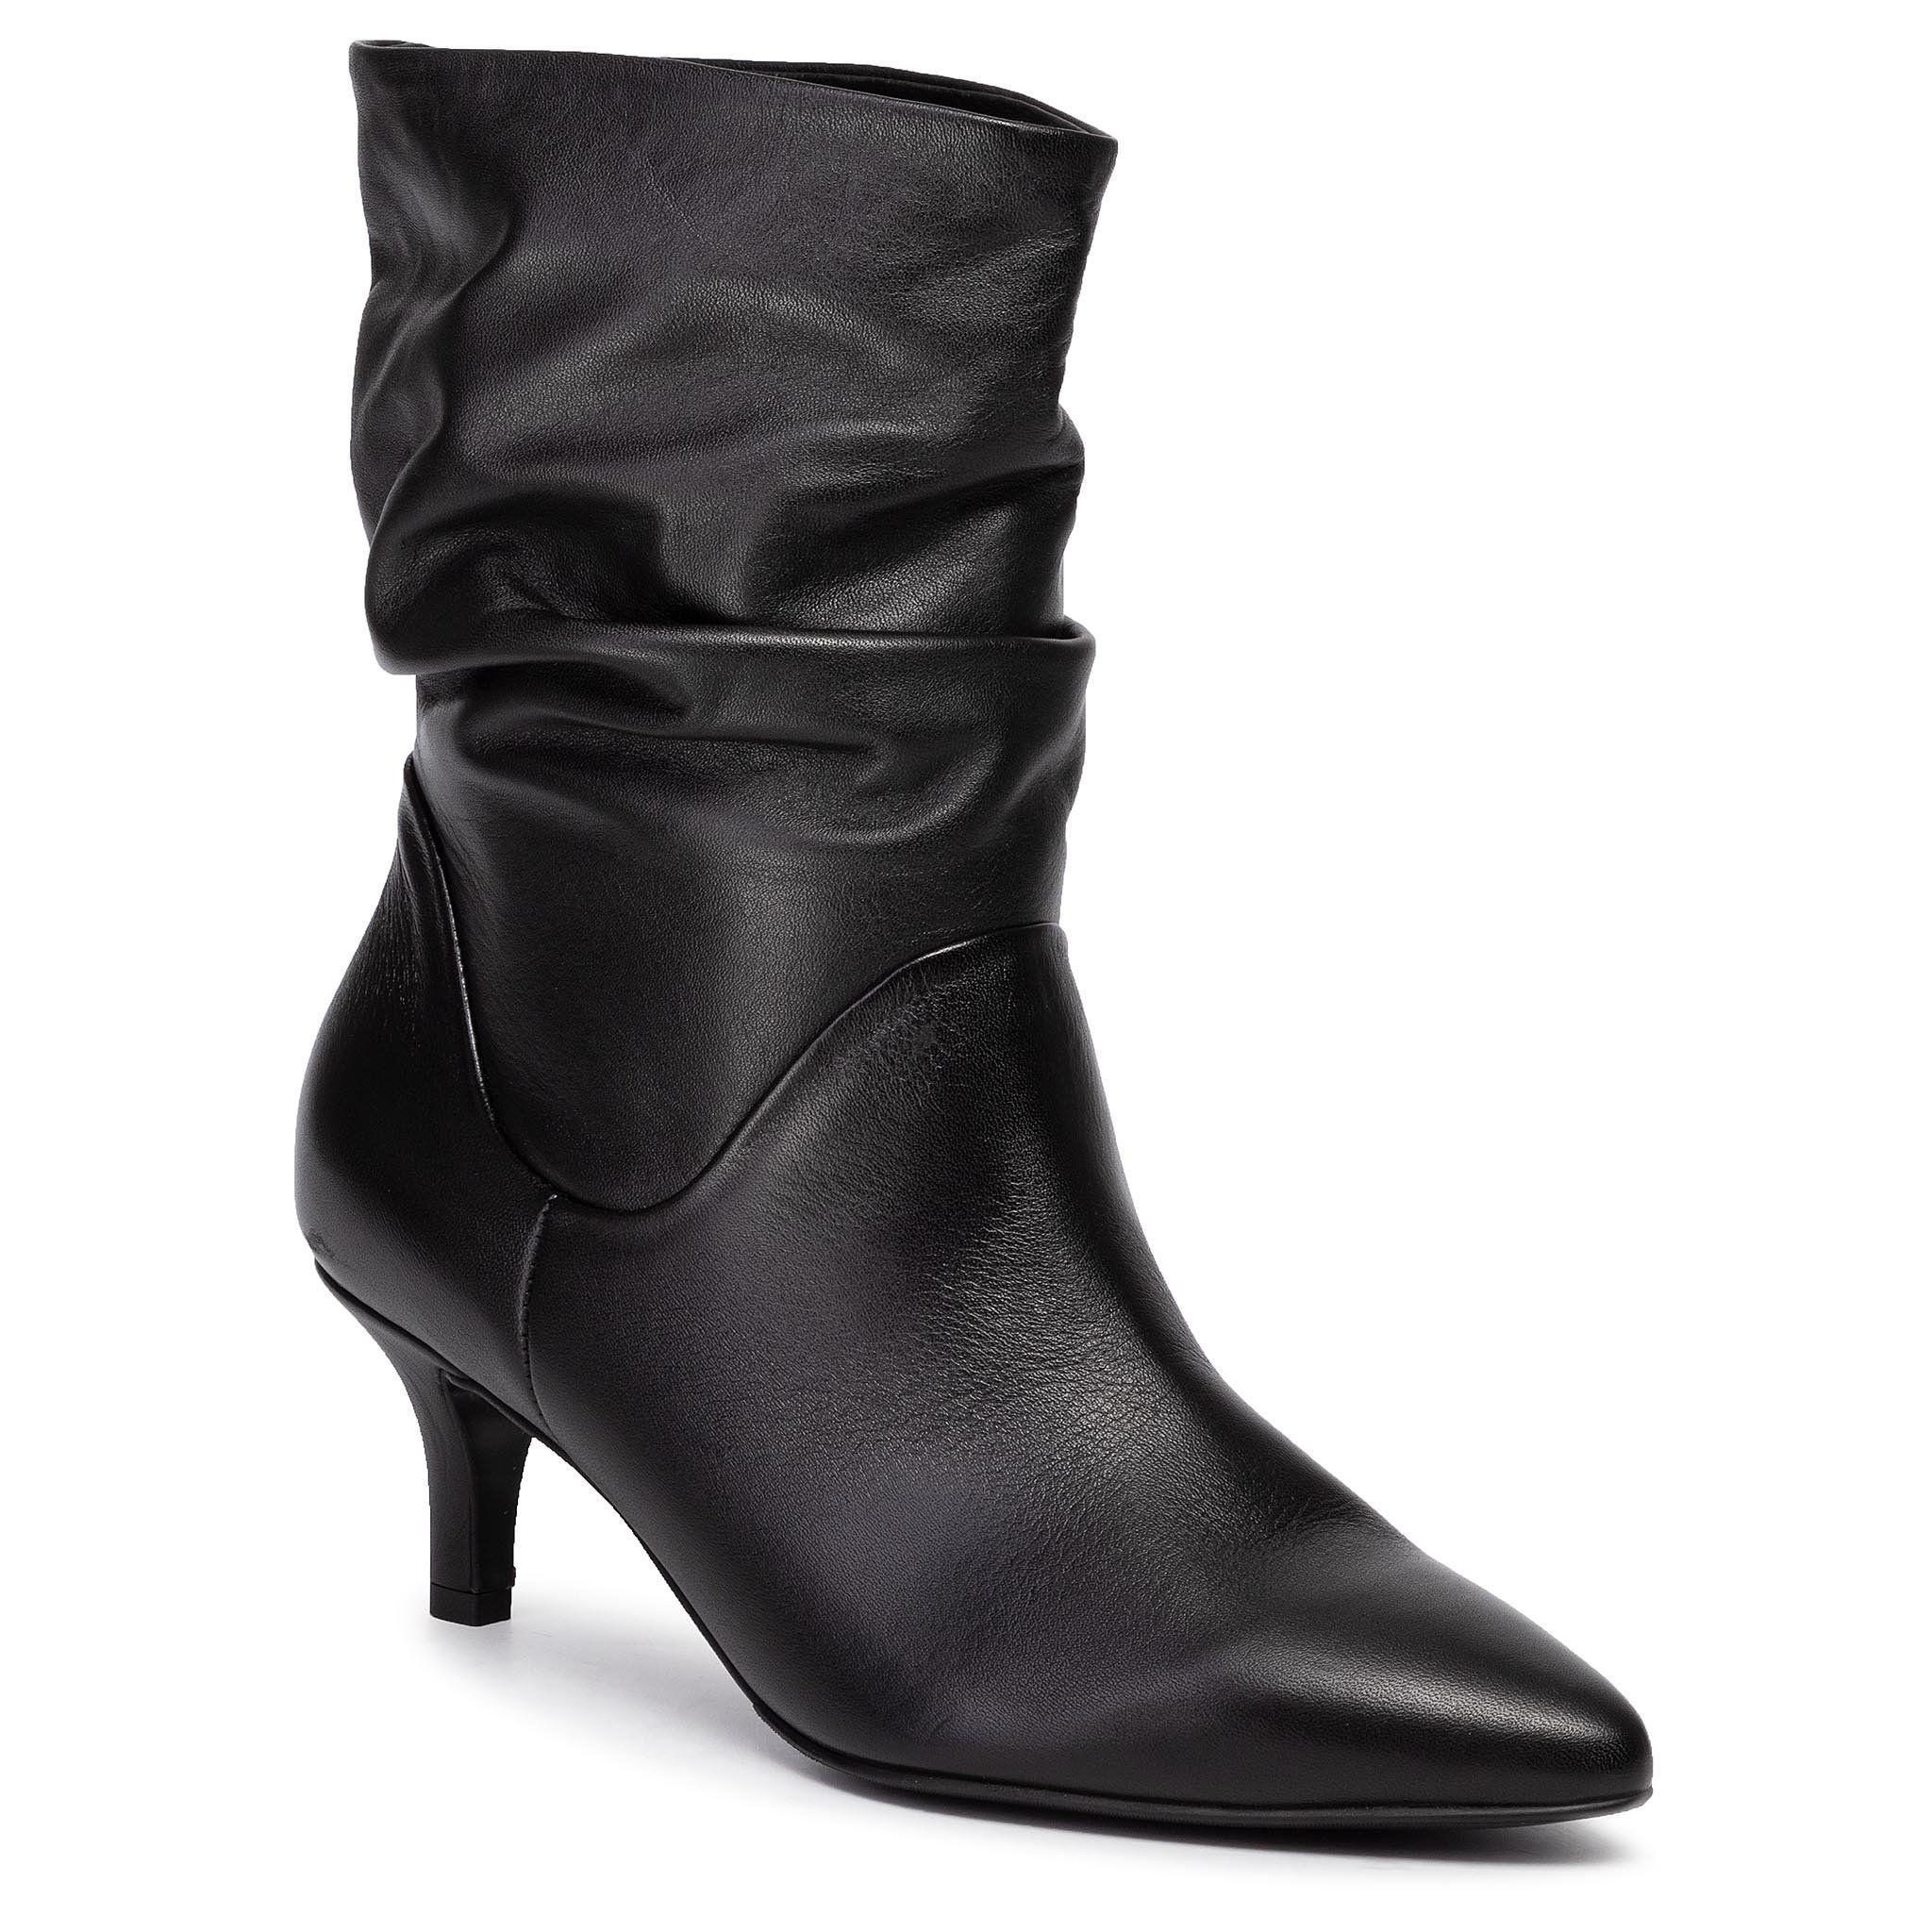 Botki Gino Rossi Gino Rossi 325 780 Czarny Heels Boots Stiletto Boot